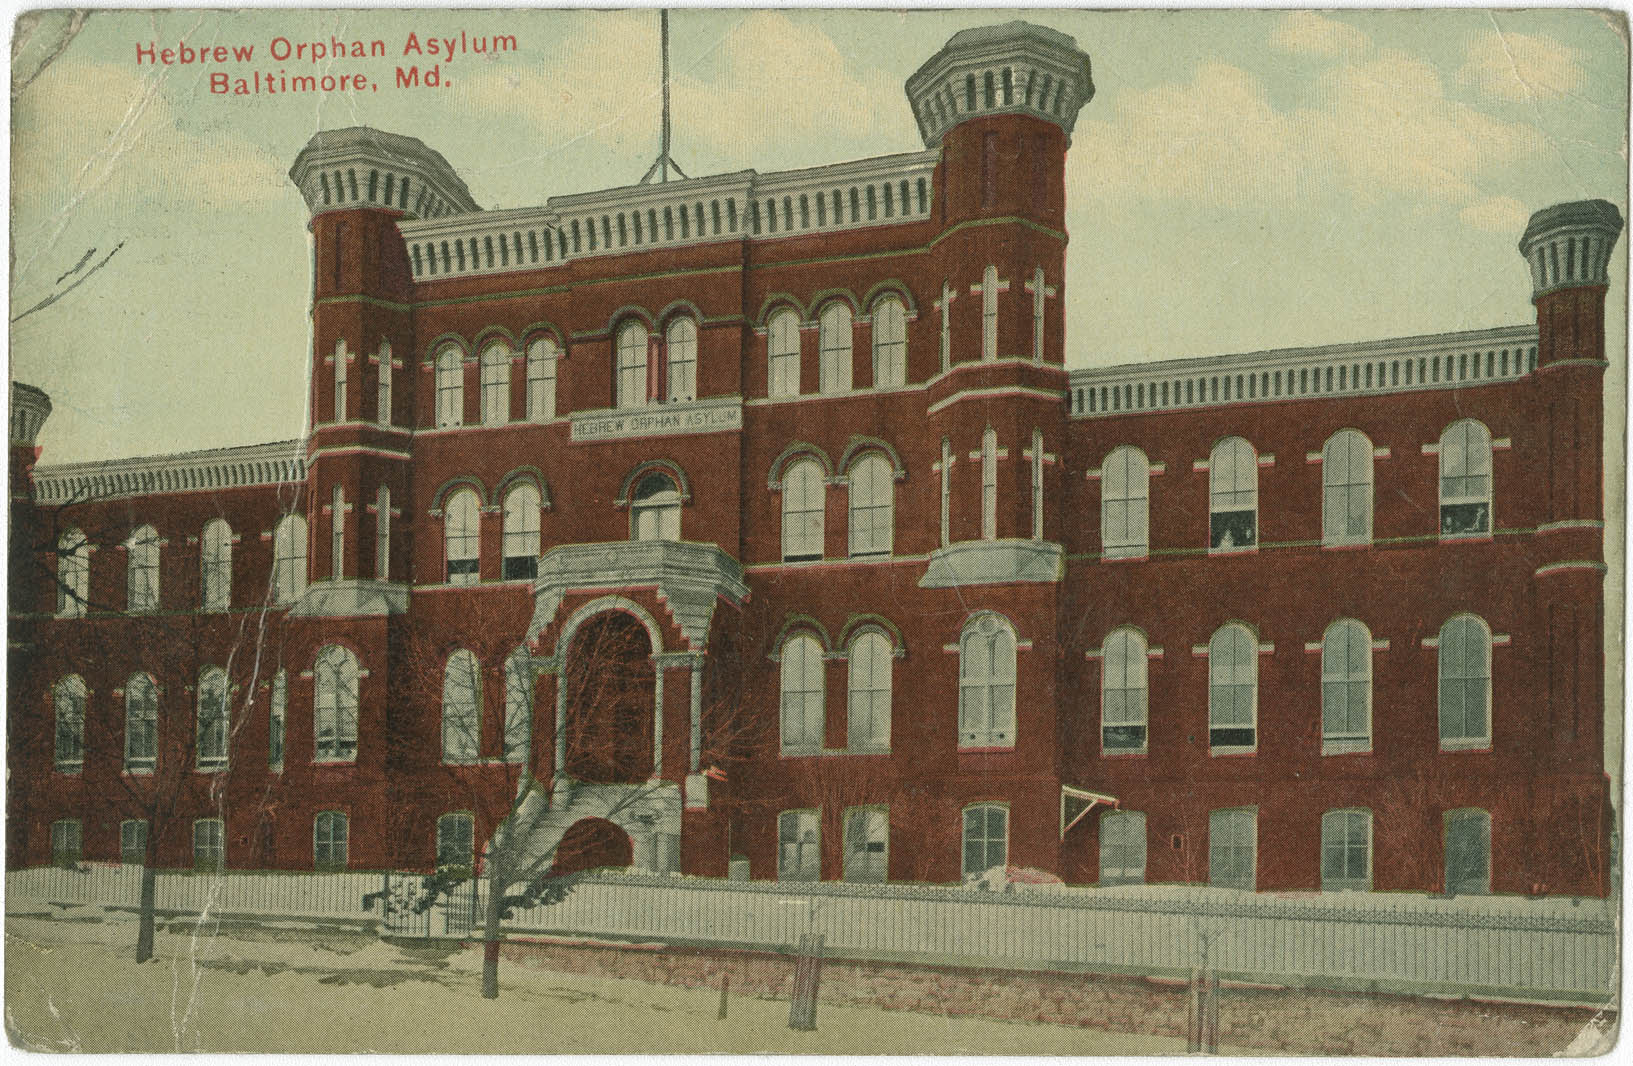 Hebrew Orphan Asylum, Baltimore, Md.